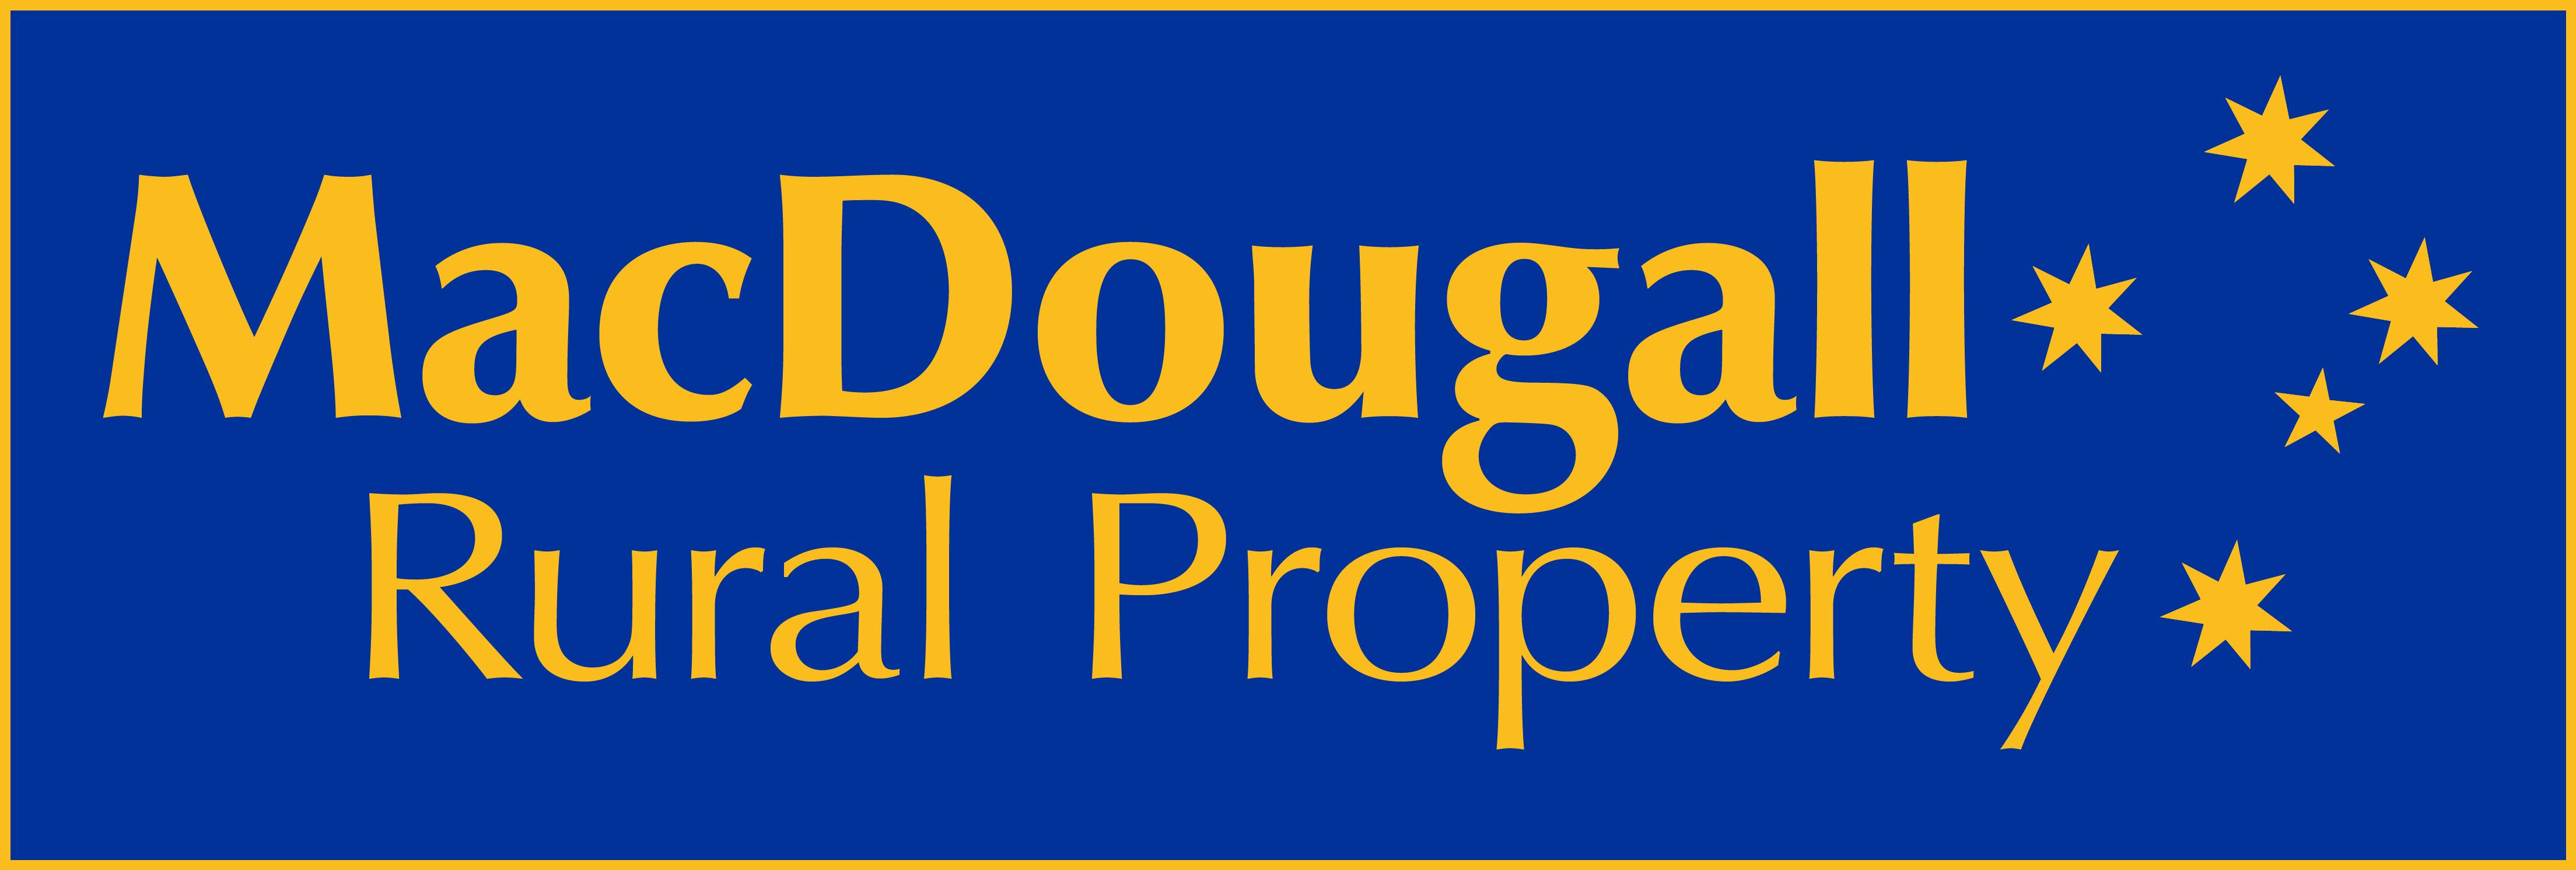 MacDougall Rural Property